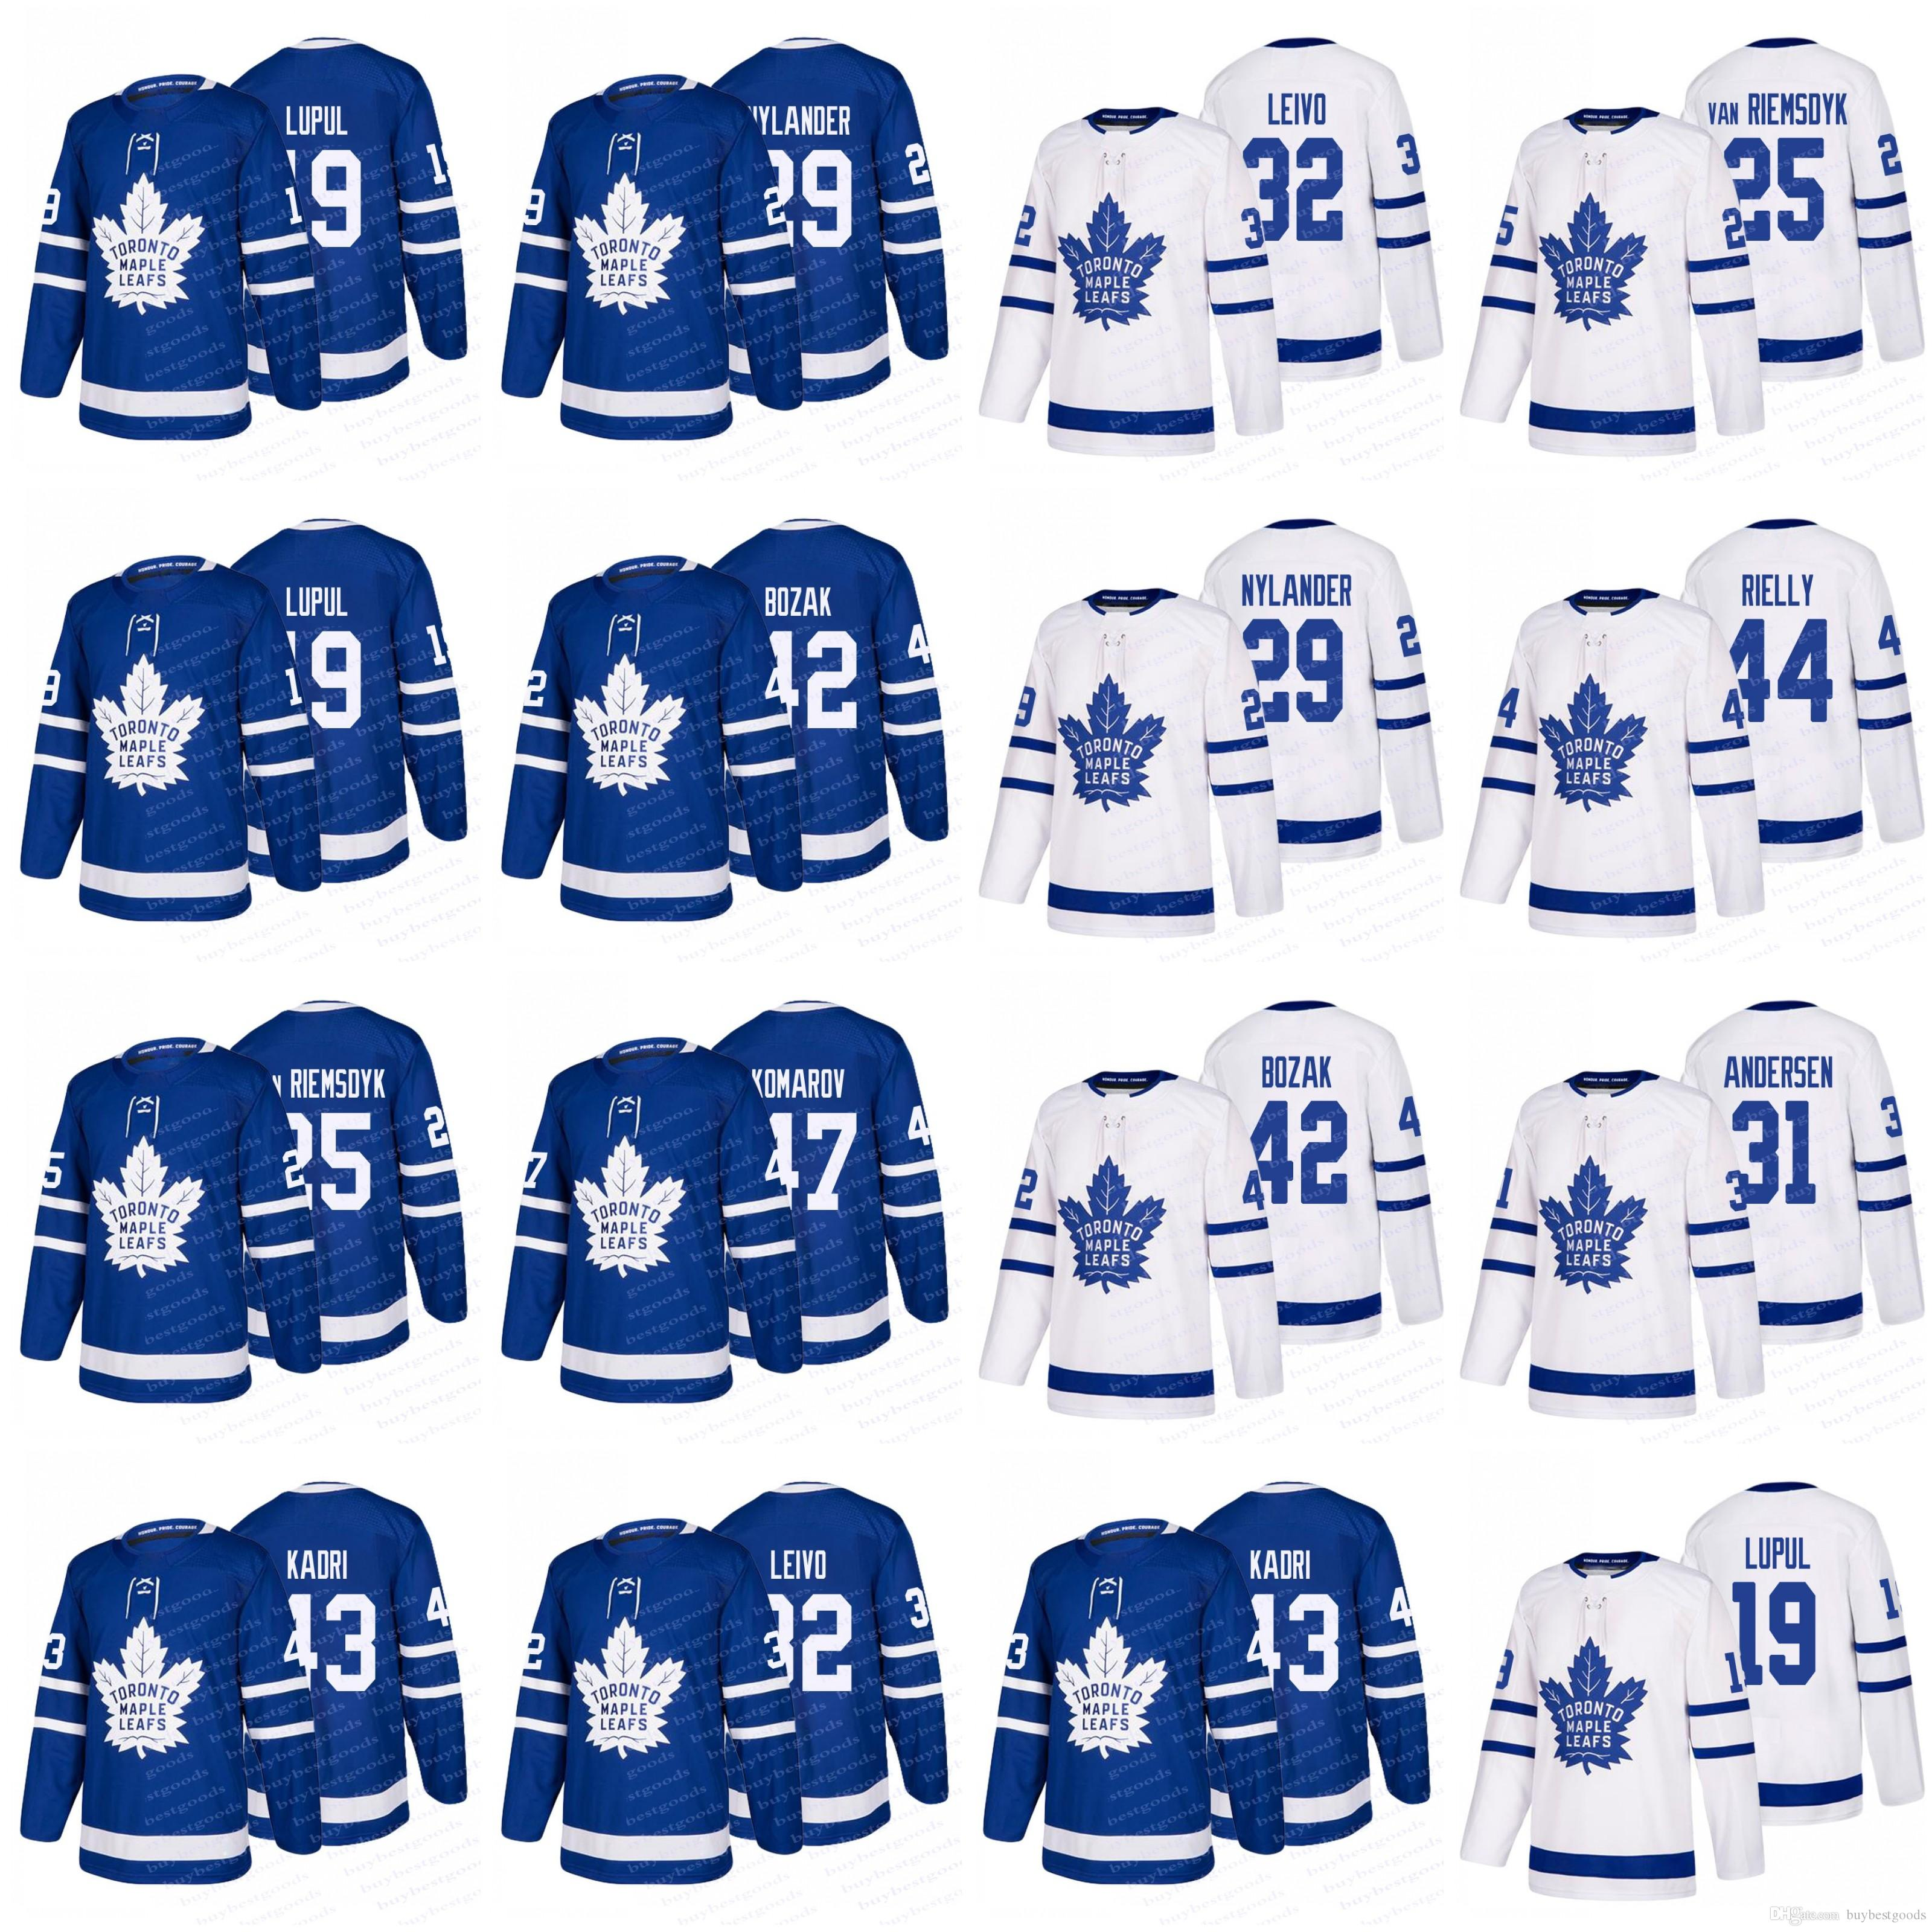 best loved 0b75e d65d3 2018 Toronto Maple Leafs Hockey Jerseys 42 Tyler Bozak 29 Tyler Bozak 44  Morgan Rielly 32 Josh Leivo 25 James Van Riemsdyk 19 Lupul